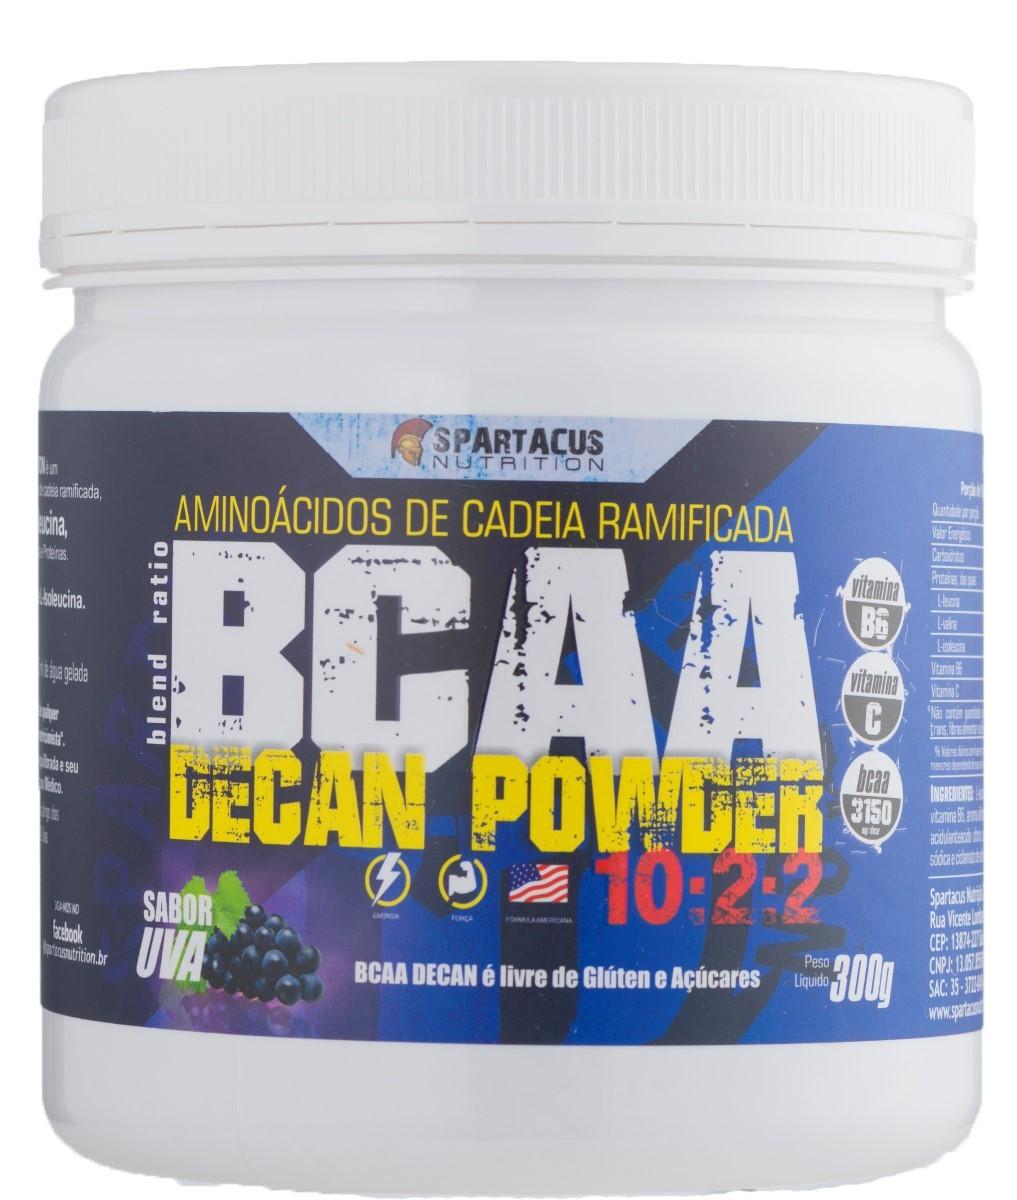 Bcaa Decan Powder 10:2:2 - Spartacus Nutrition 300g